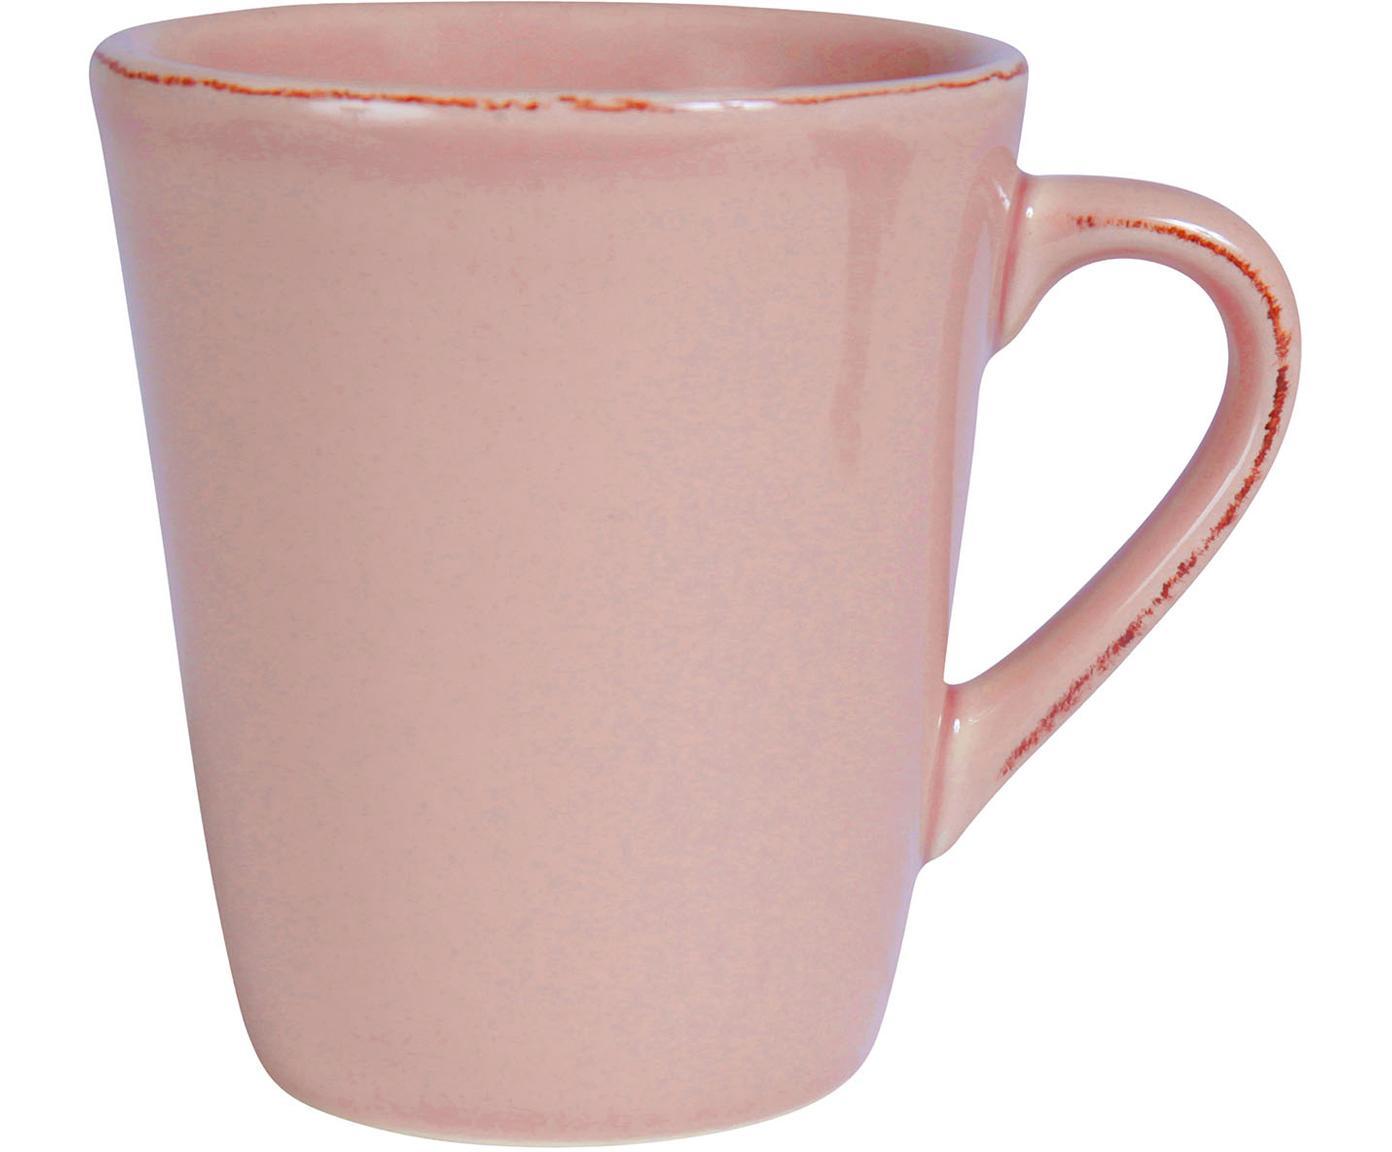 Kubek American, 2 szt., Kamionka, Blady różowy, S 9 x D 11 cm